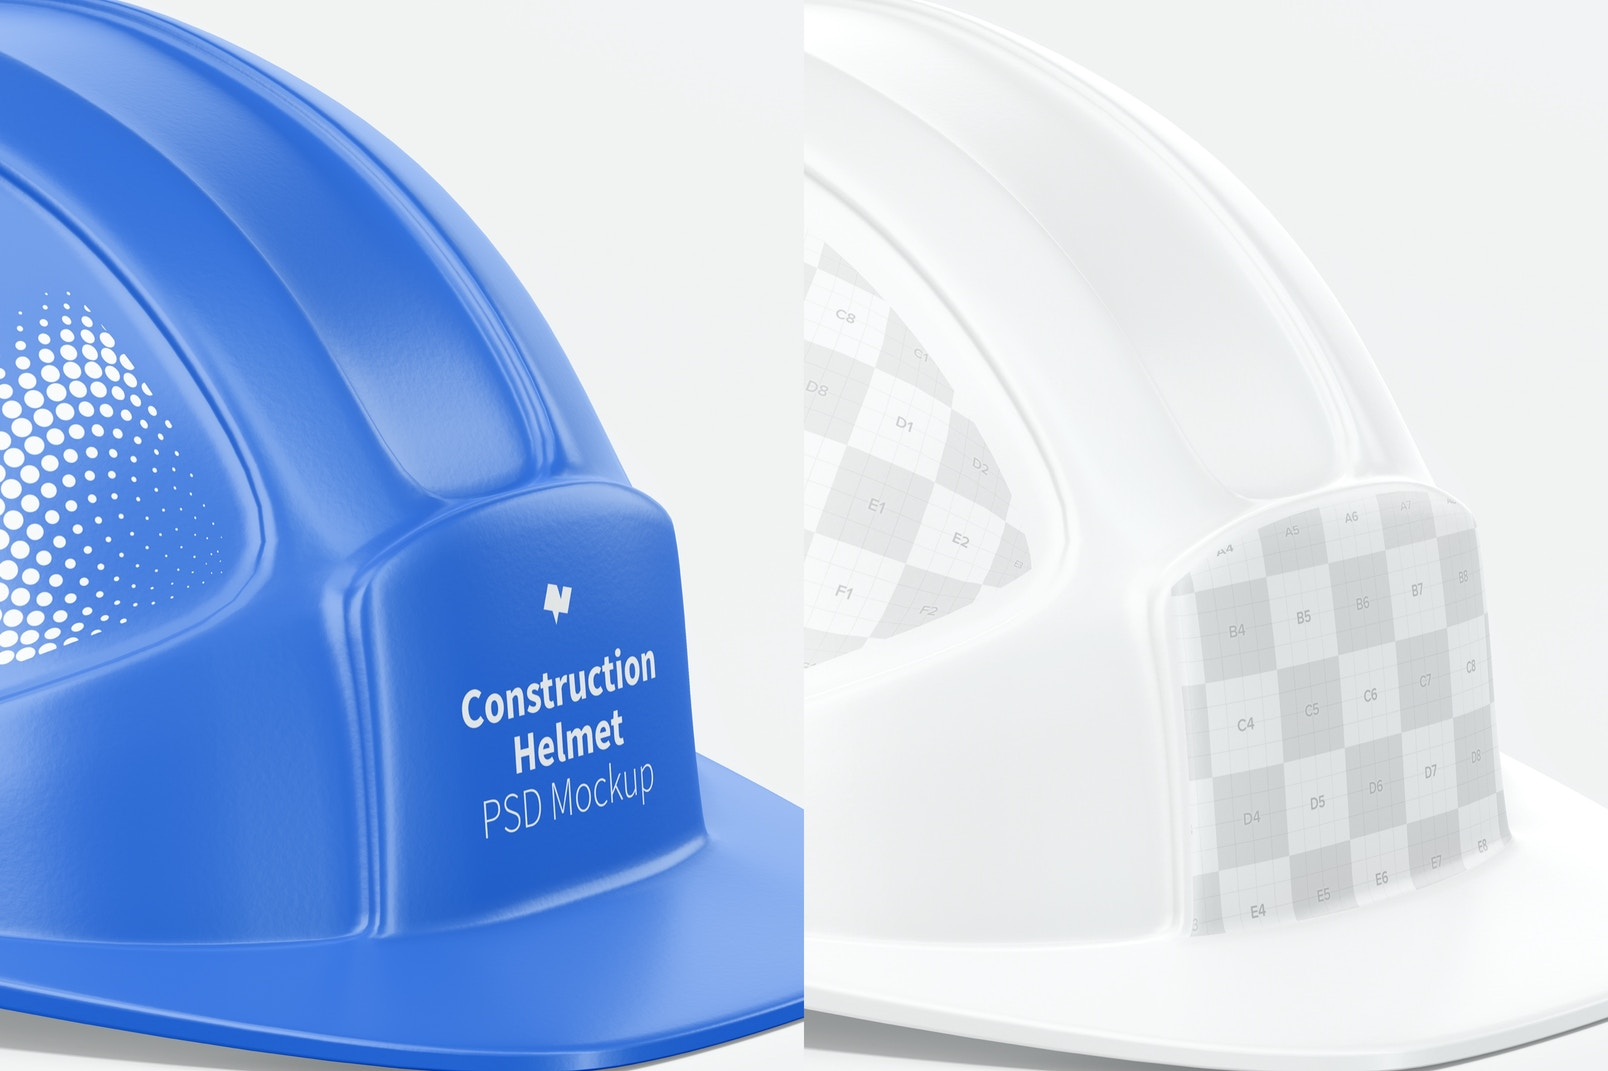 Construction Helmet Mockup, Close Up